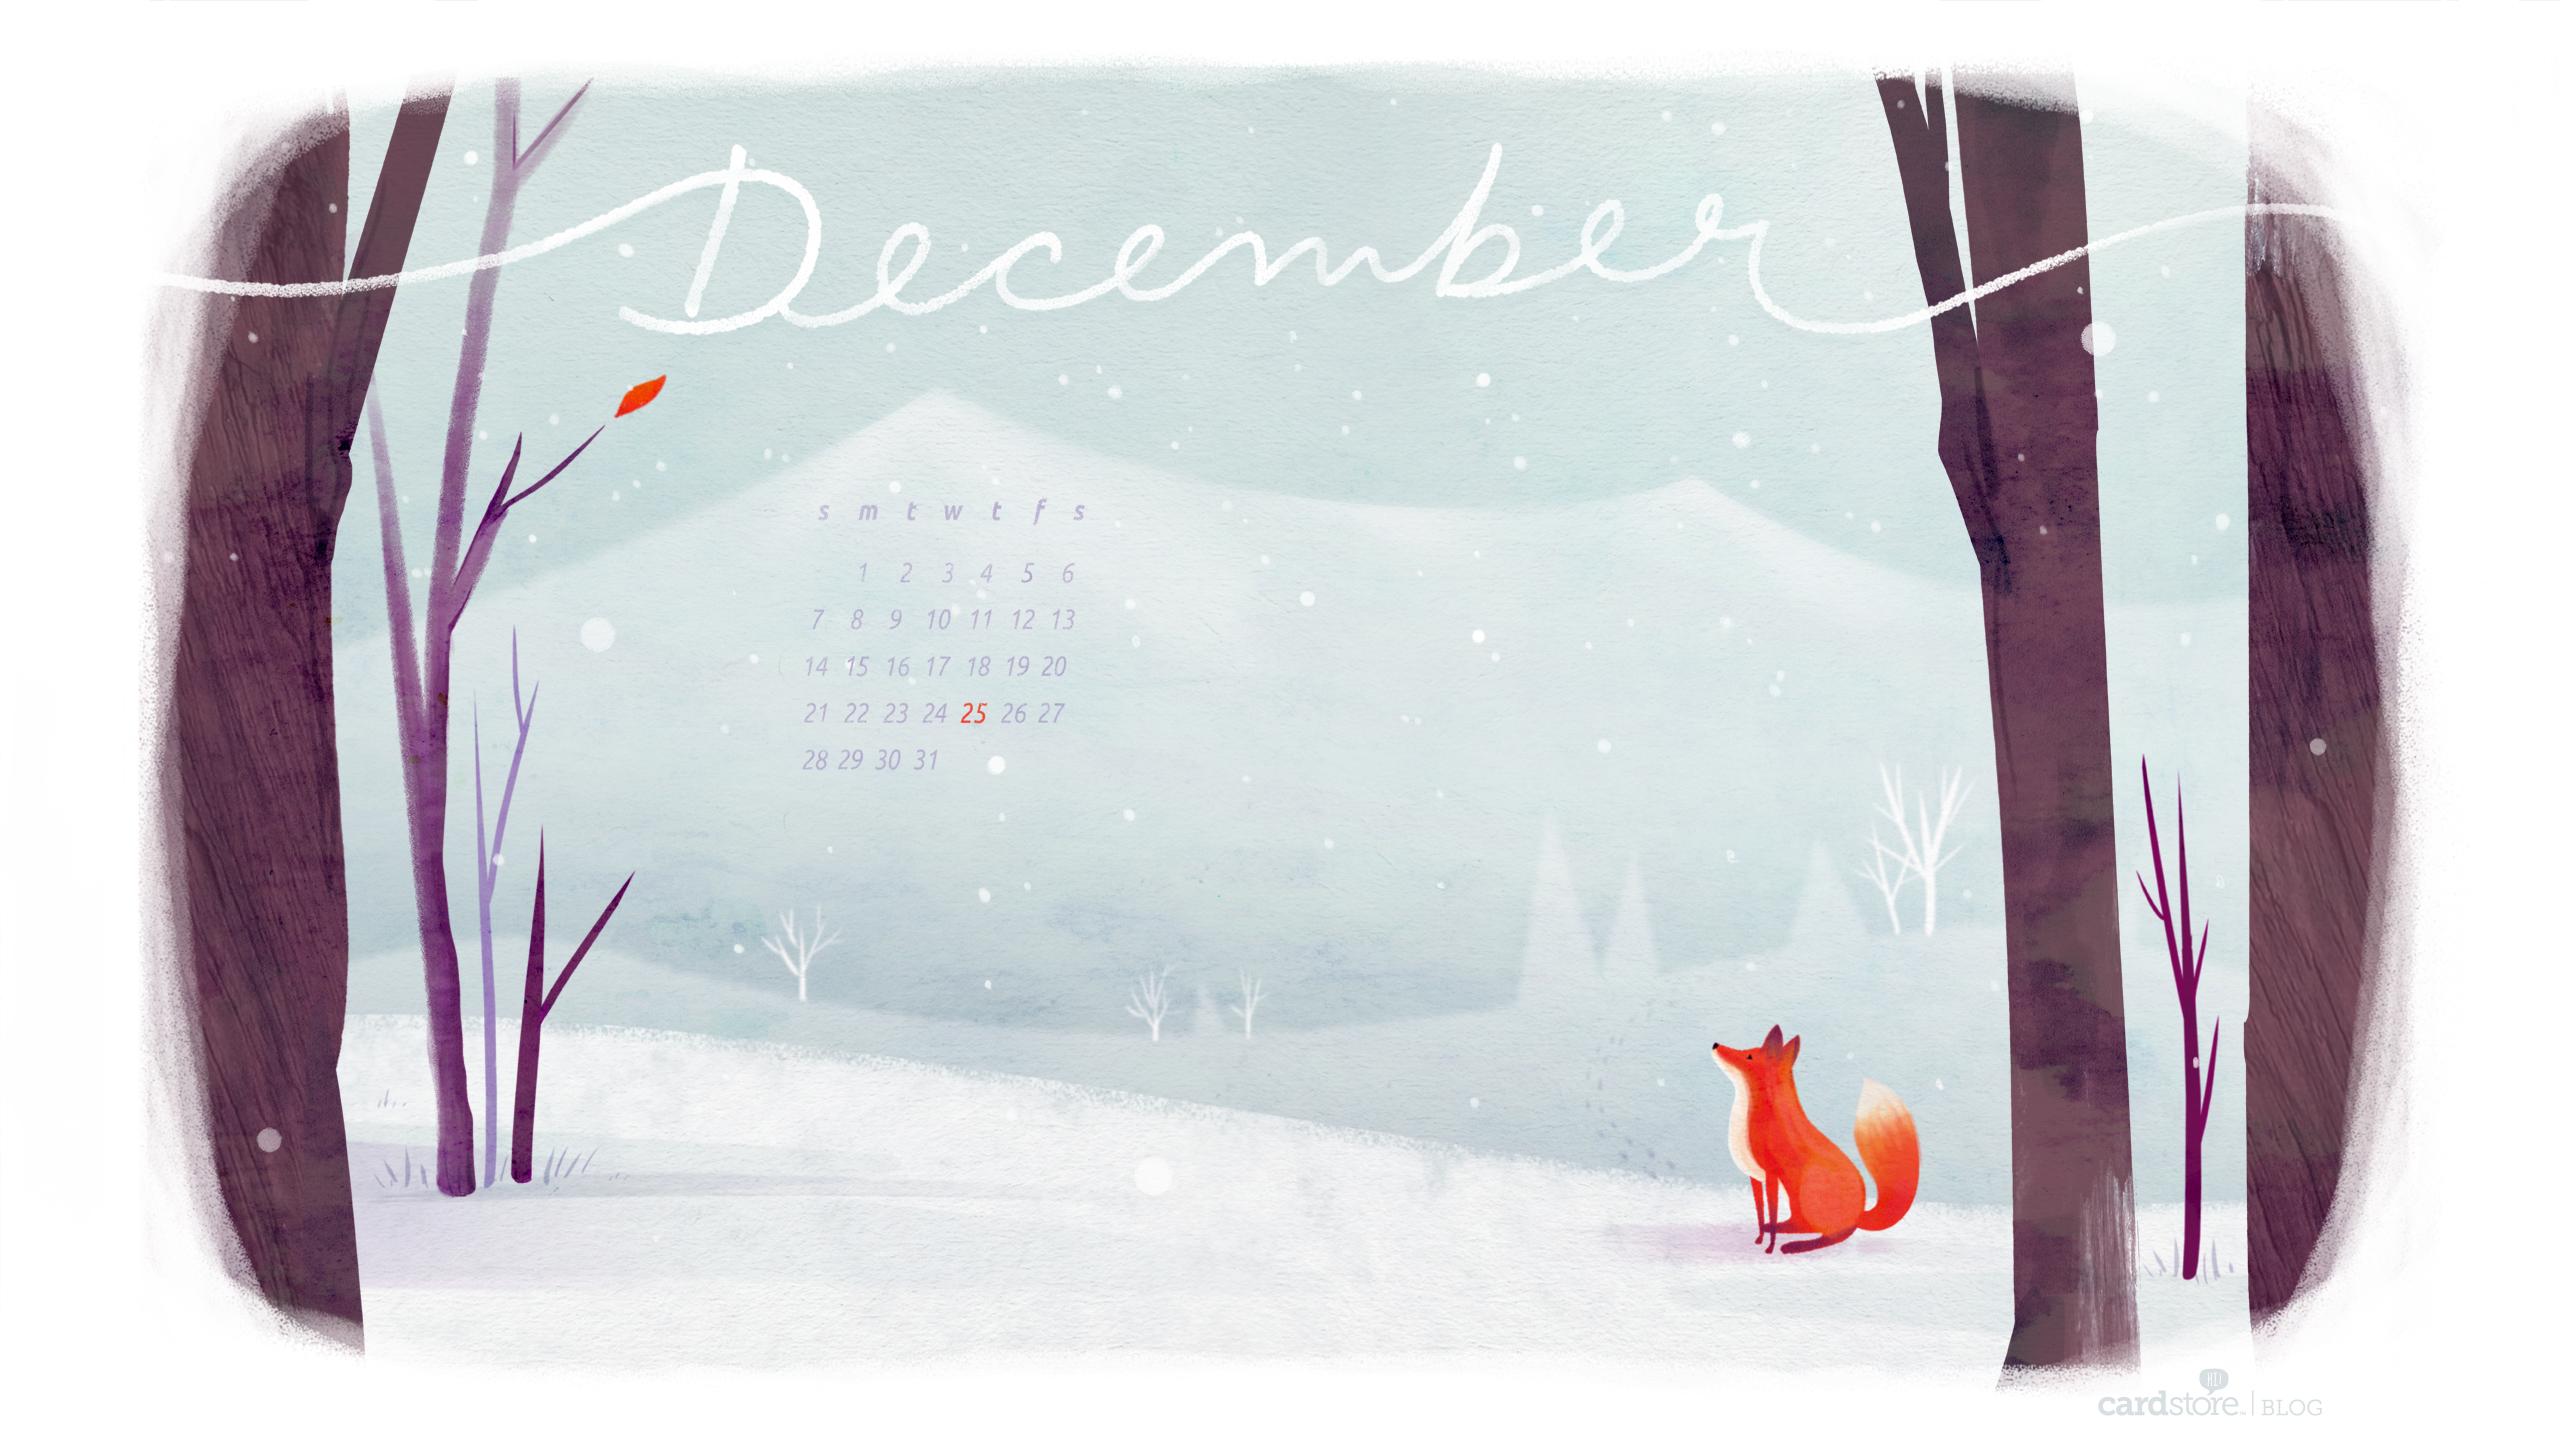 December-wallpaper-DECEMBER_2560X1440